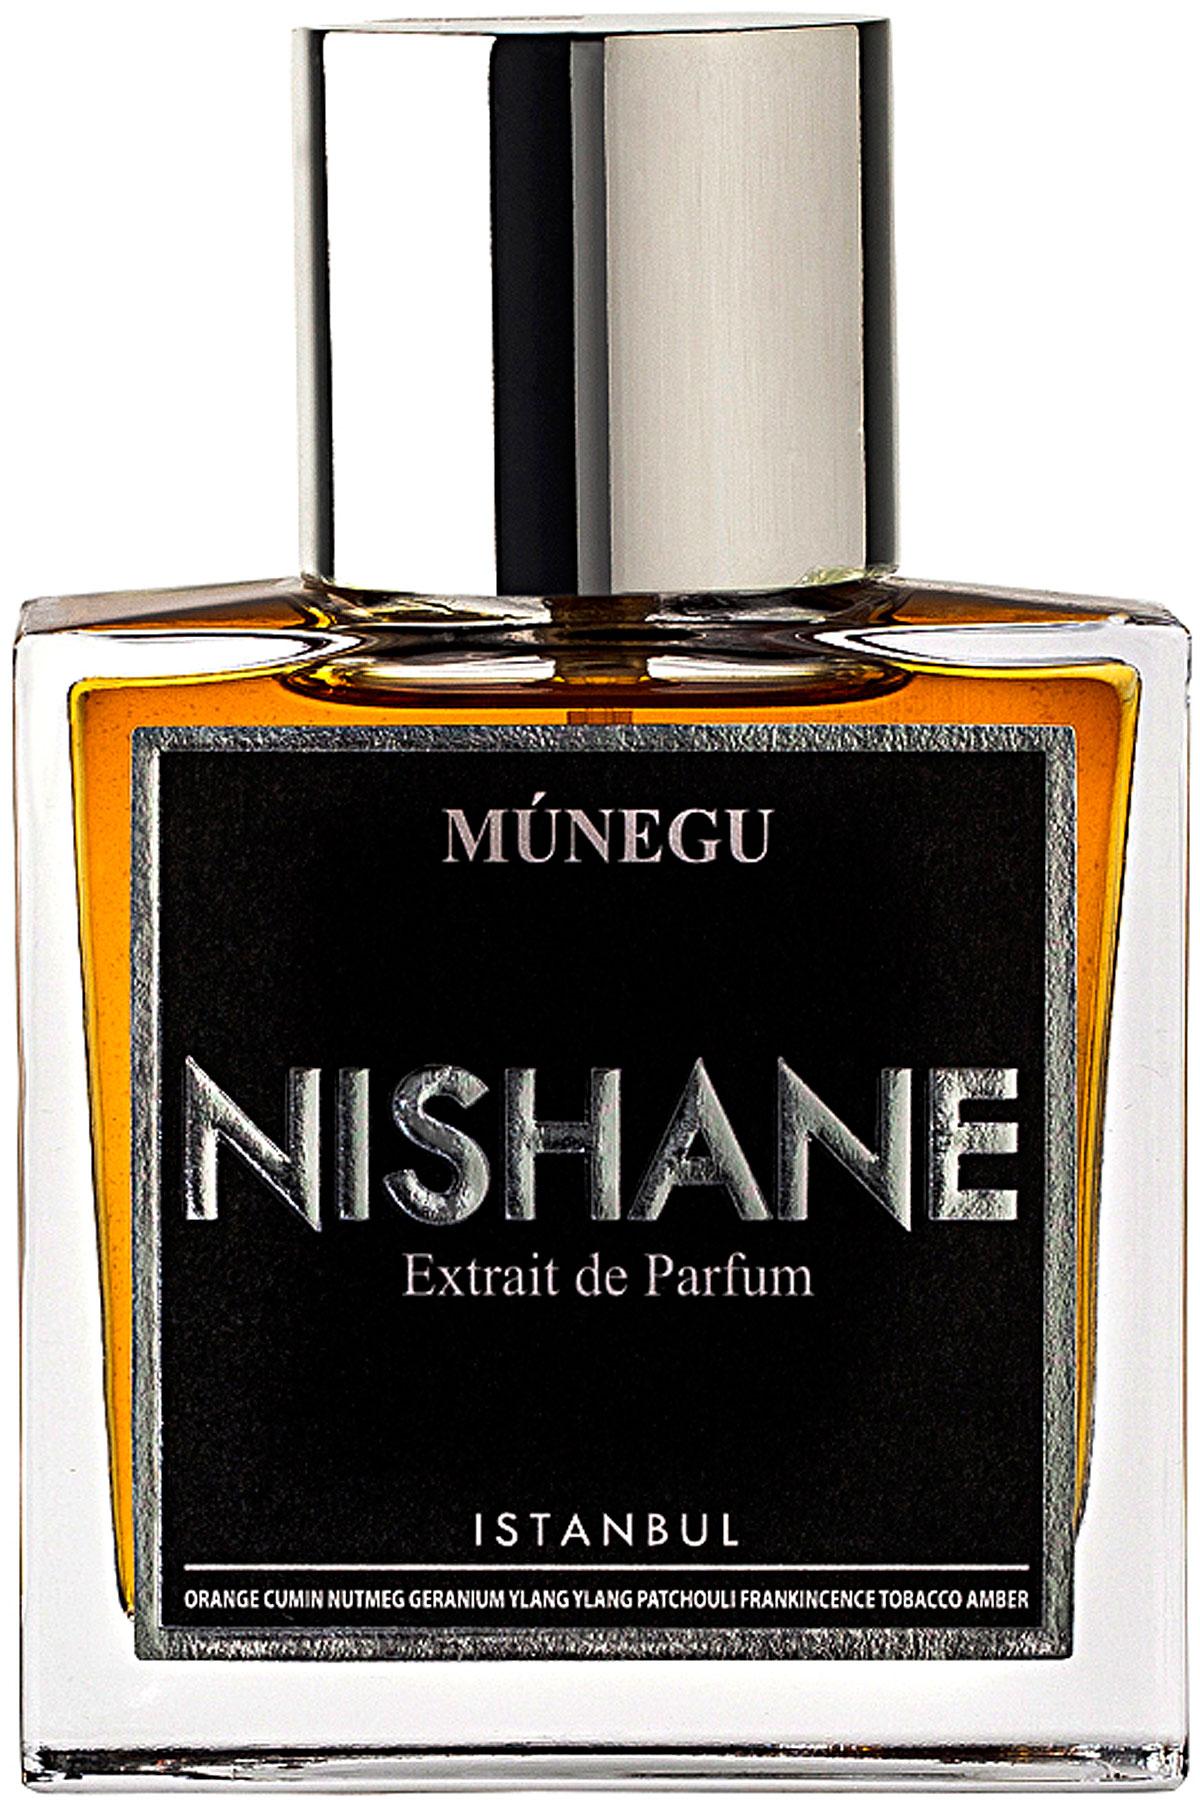 Nishane Fragrances for Women, Munegu - Extrait De Parfum - 50 Ml, 2019, 50 ml